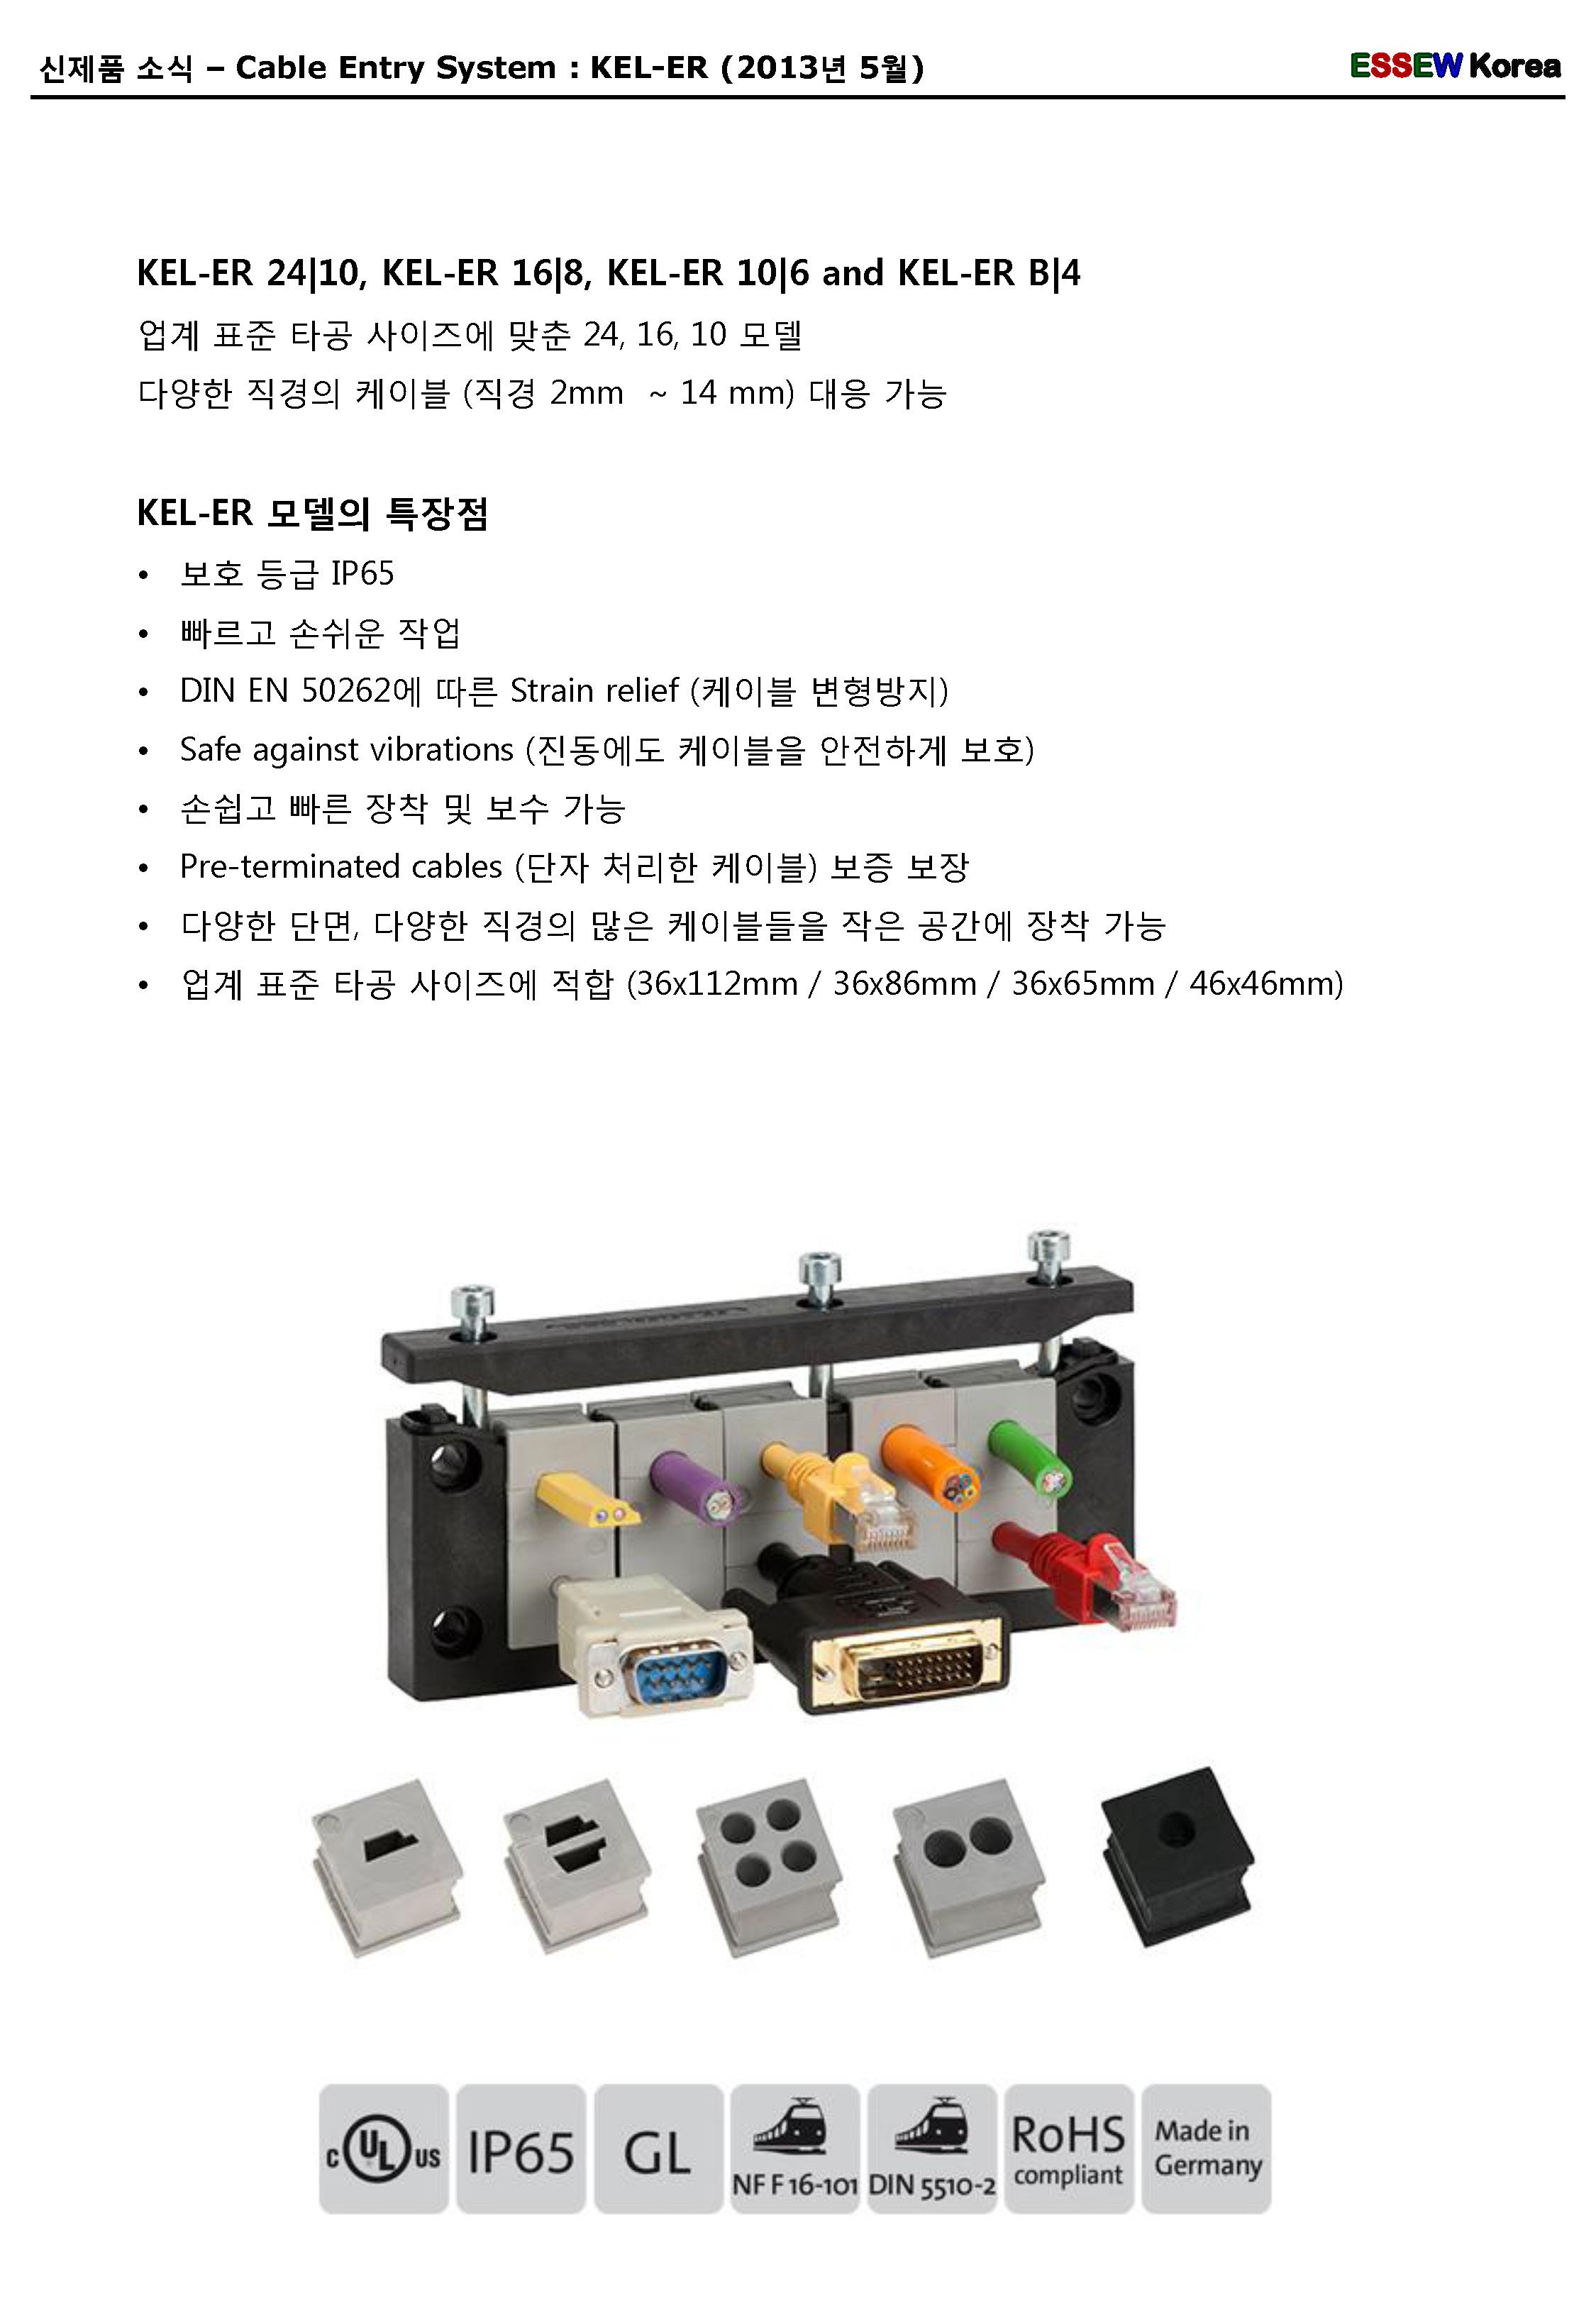 icotek 신제품 소식 (2013 05)_페이지_1.jpg